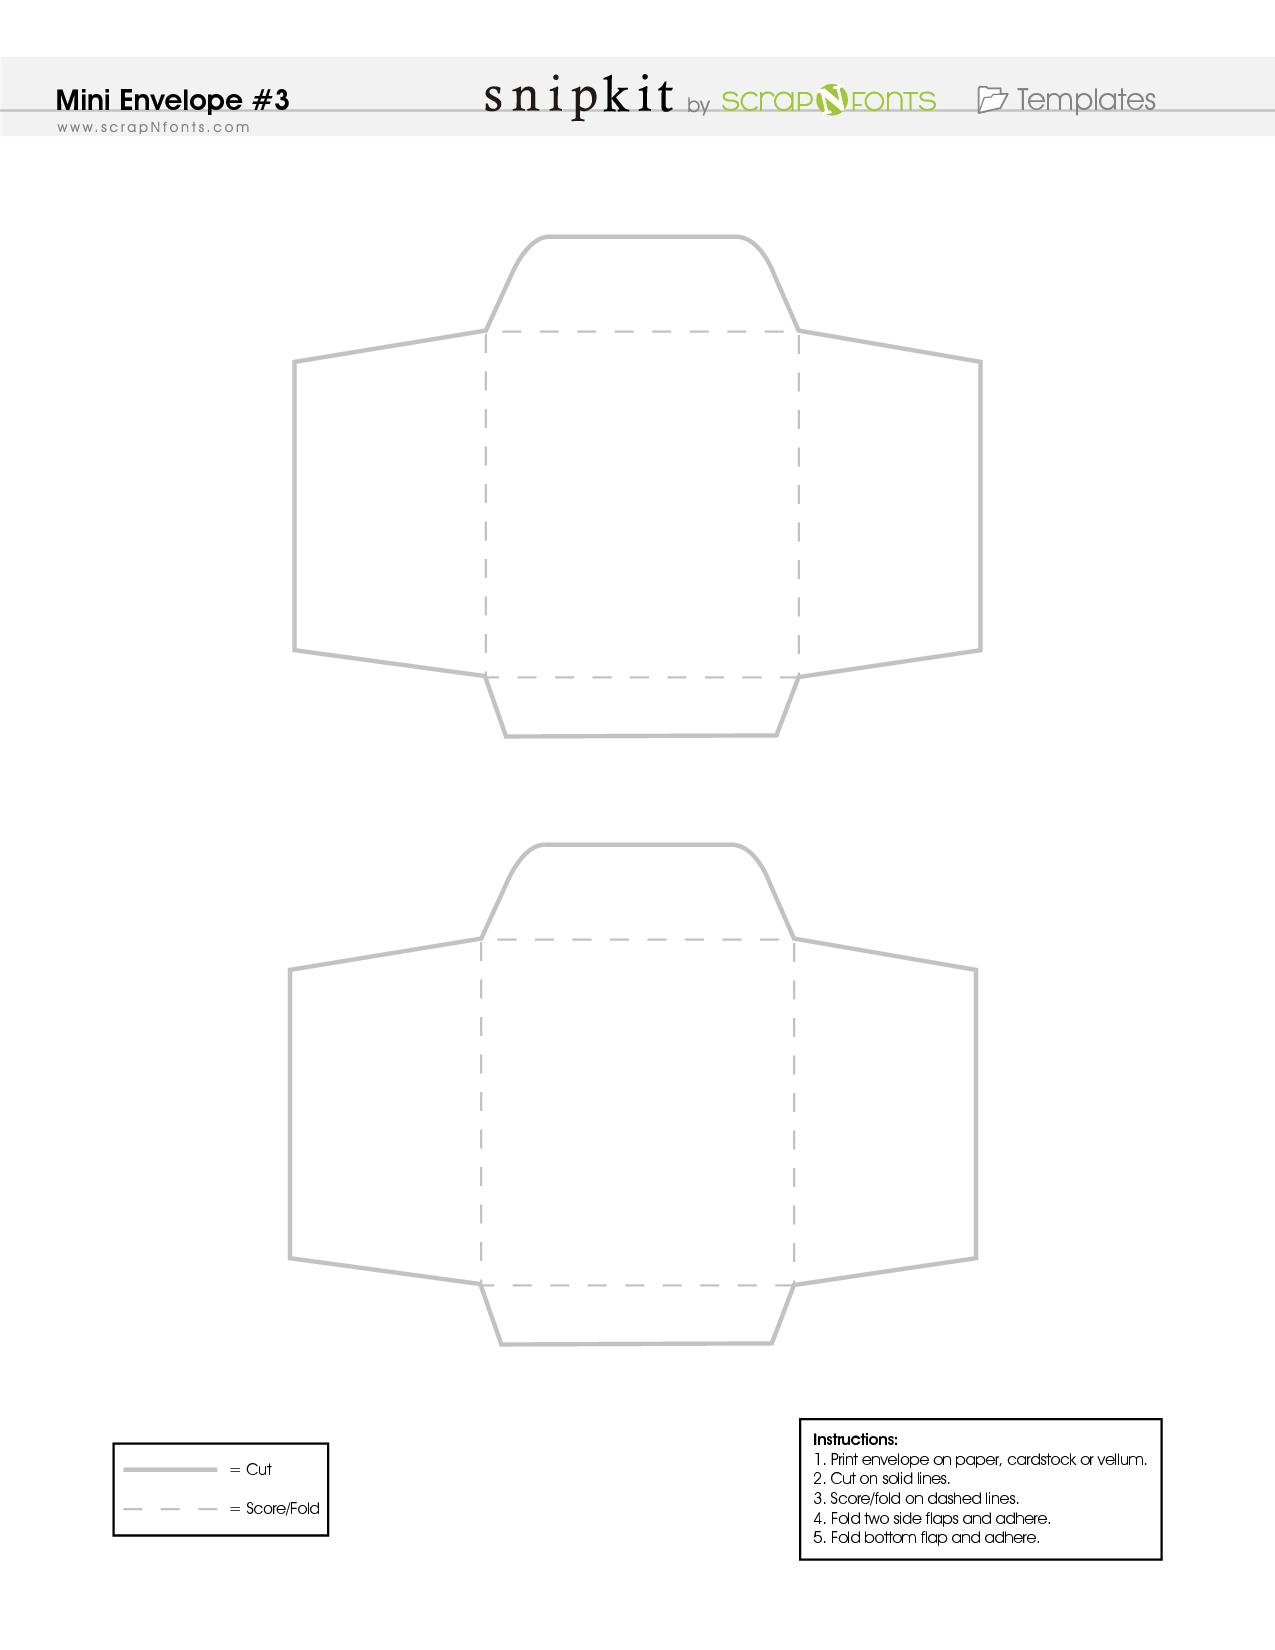 Free Printable Mini Envelope Template - Pdf   Scrapbooking - Mini - Free Printable Greeting Card Envelope Template